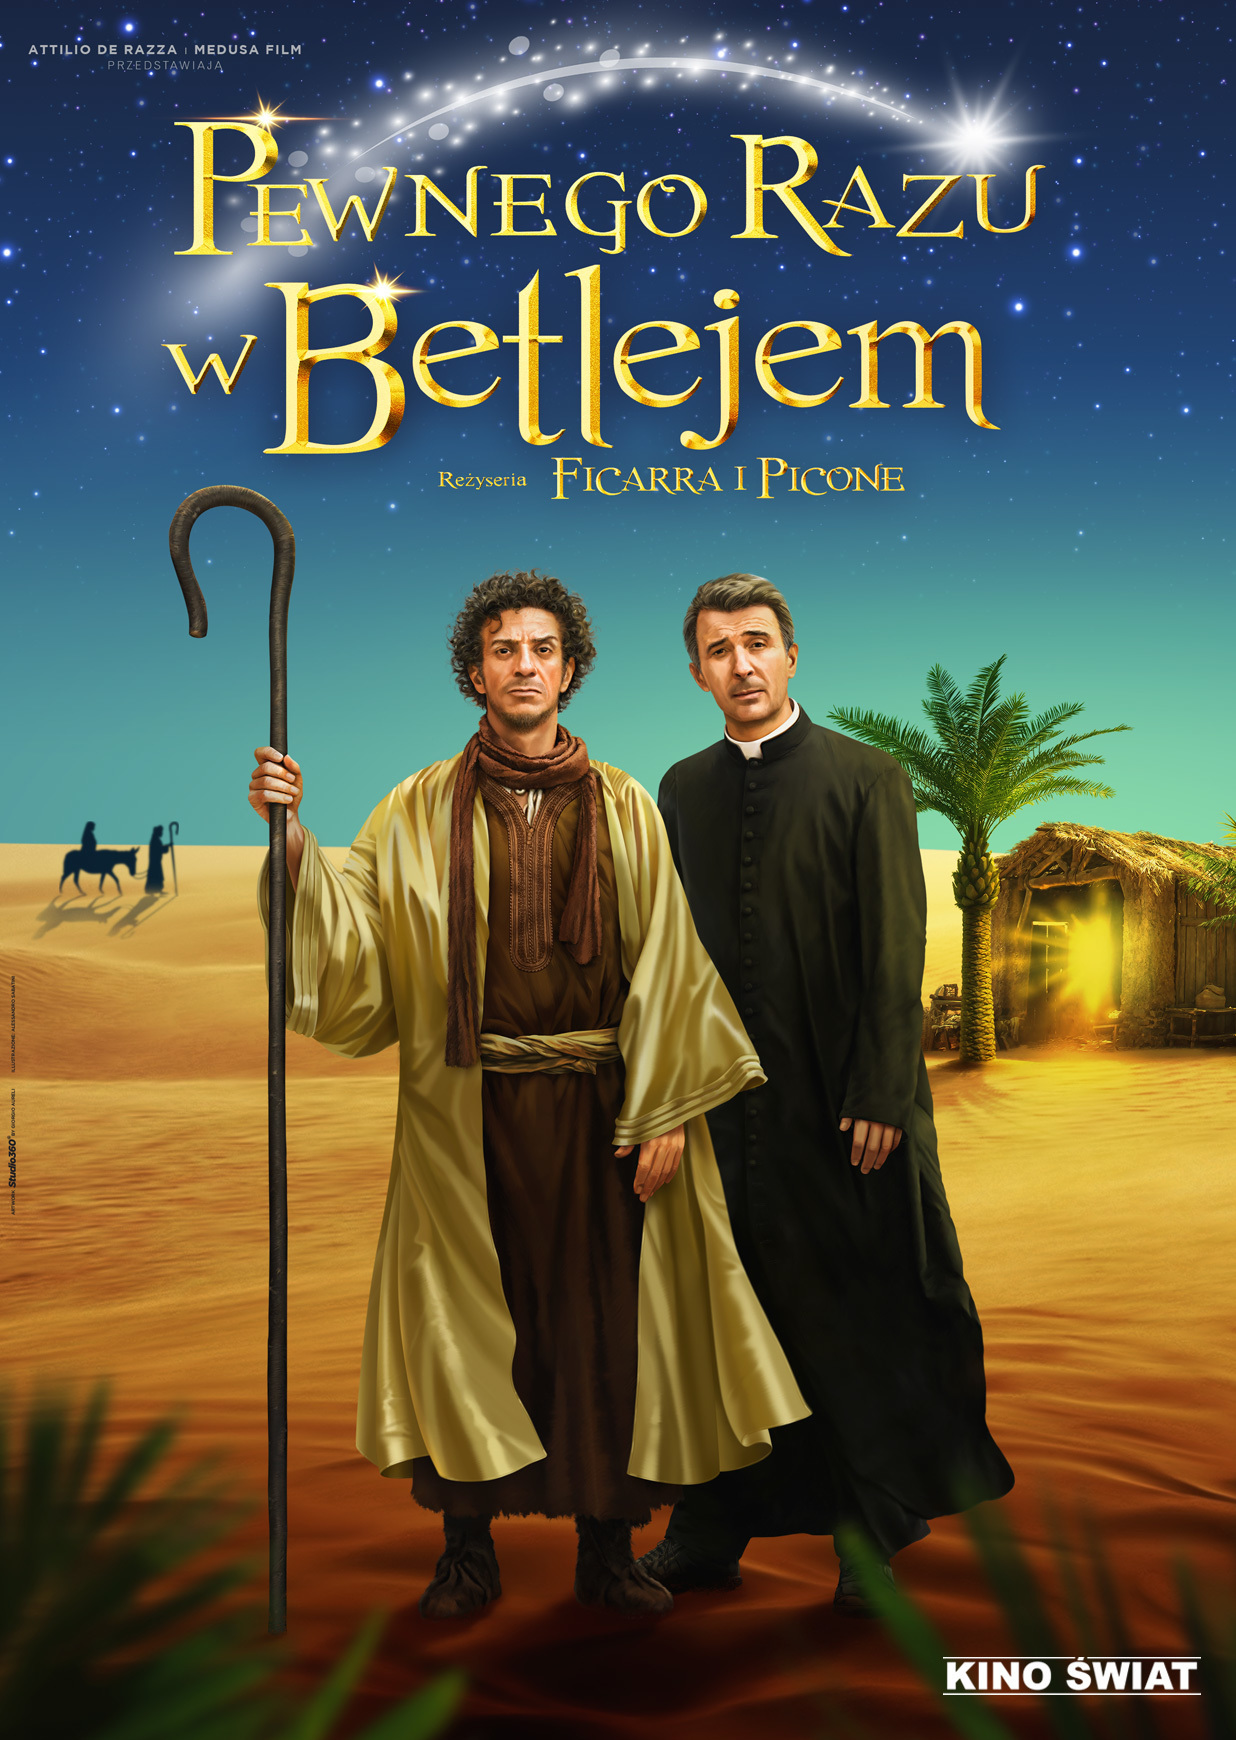 Pewnego razy w Betlejem